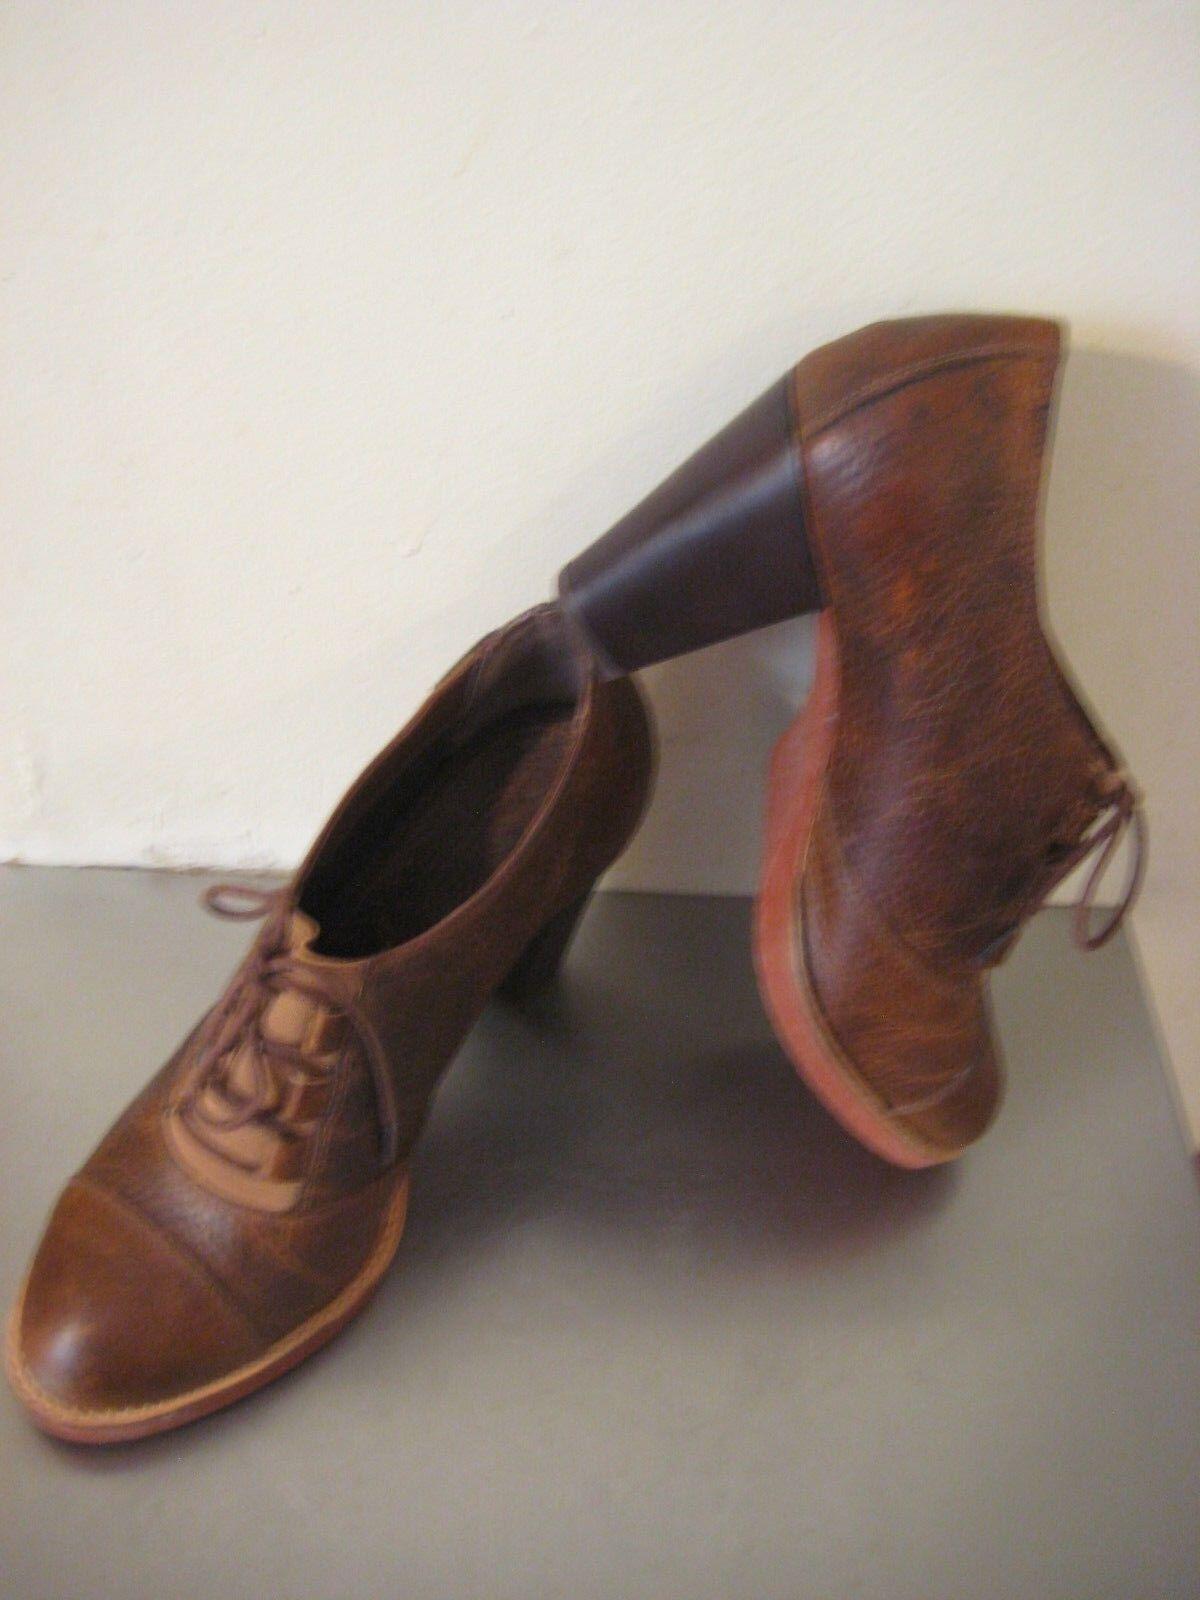 G. H Bass & Co. Schuhes Oxford Pumps Brogues Leder Lace up Heels. Sz 7.5